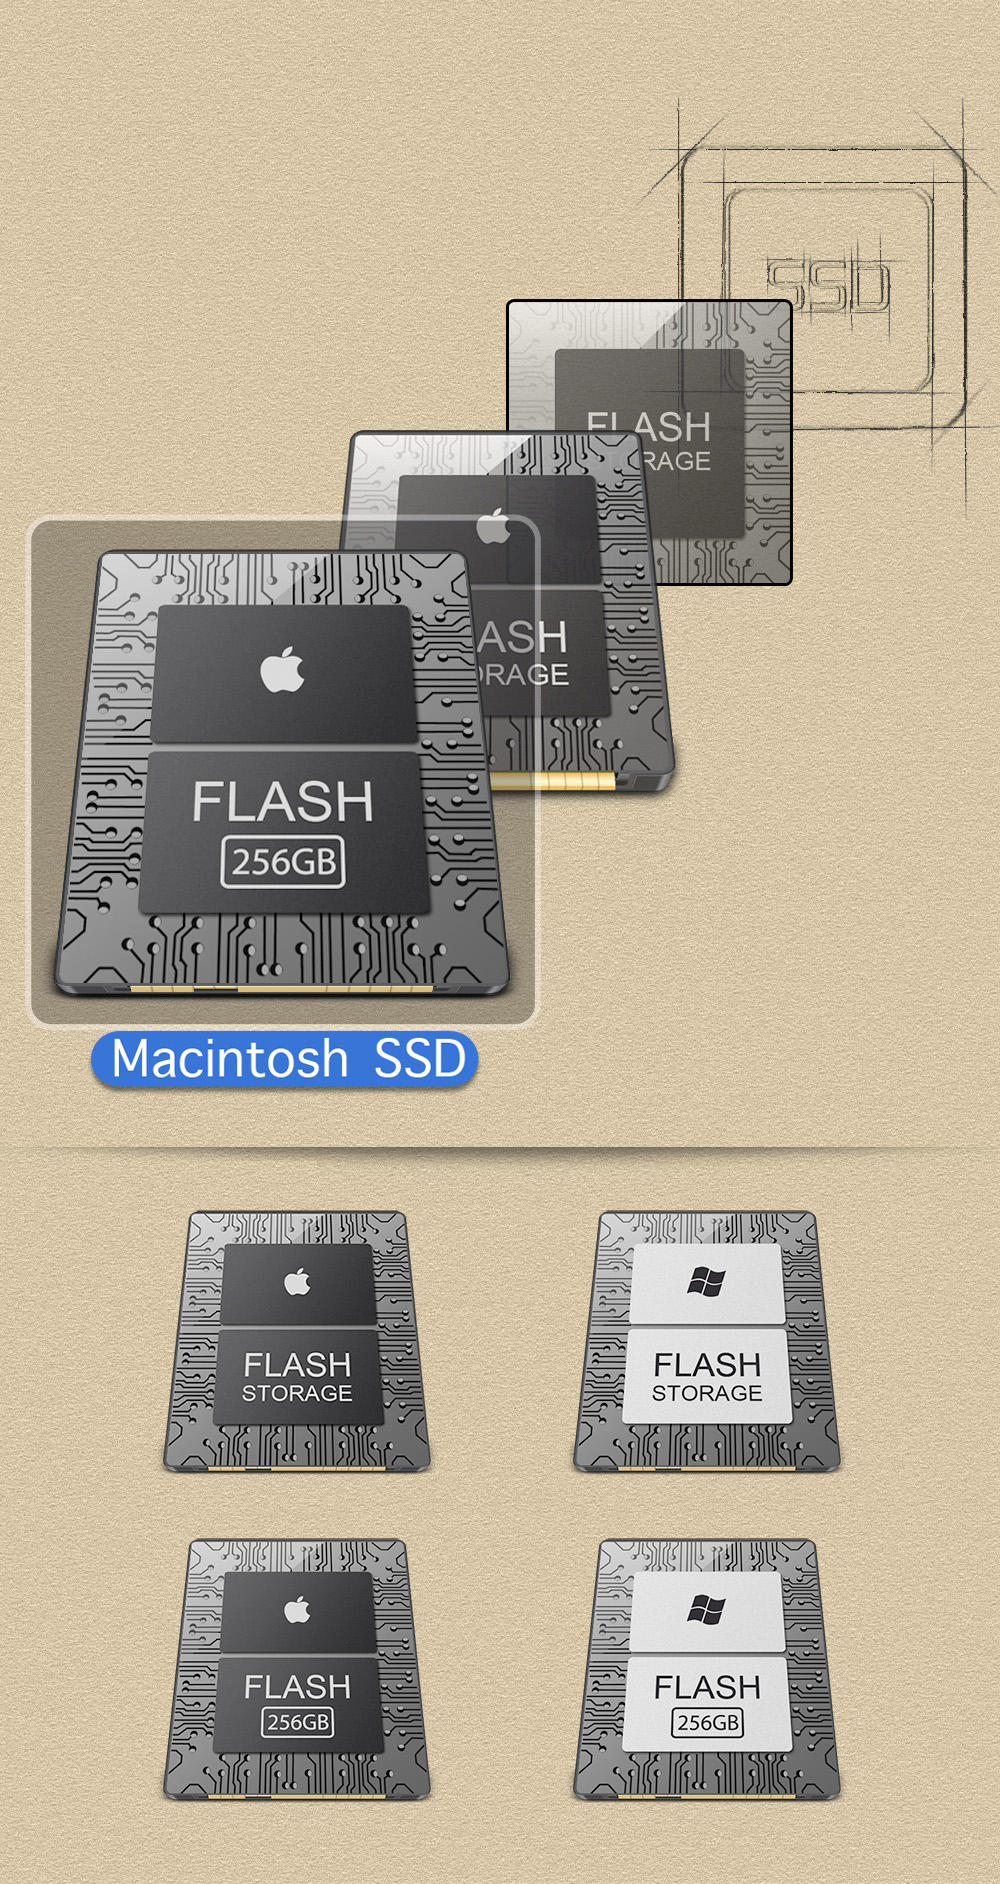 Macintosh SSD for macbook air by emrys9